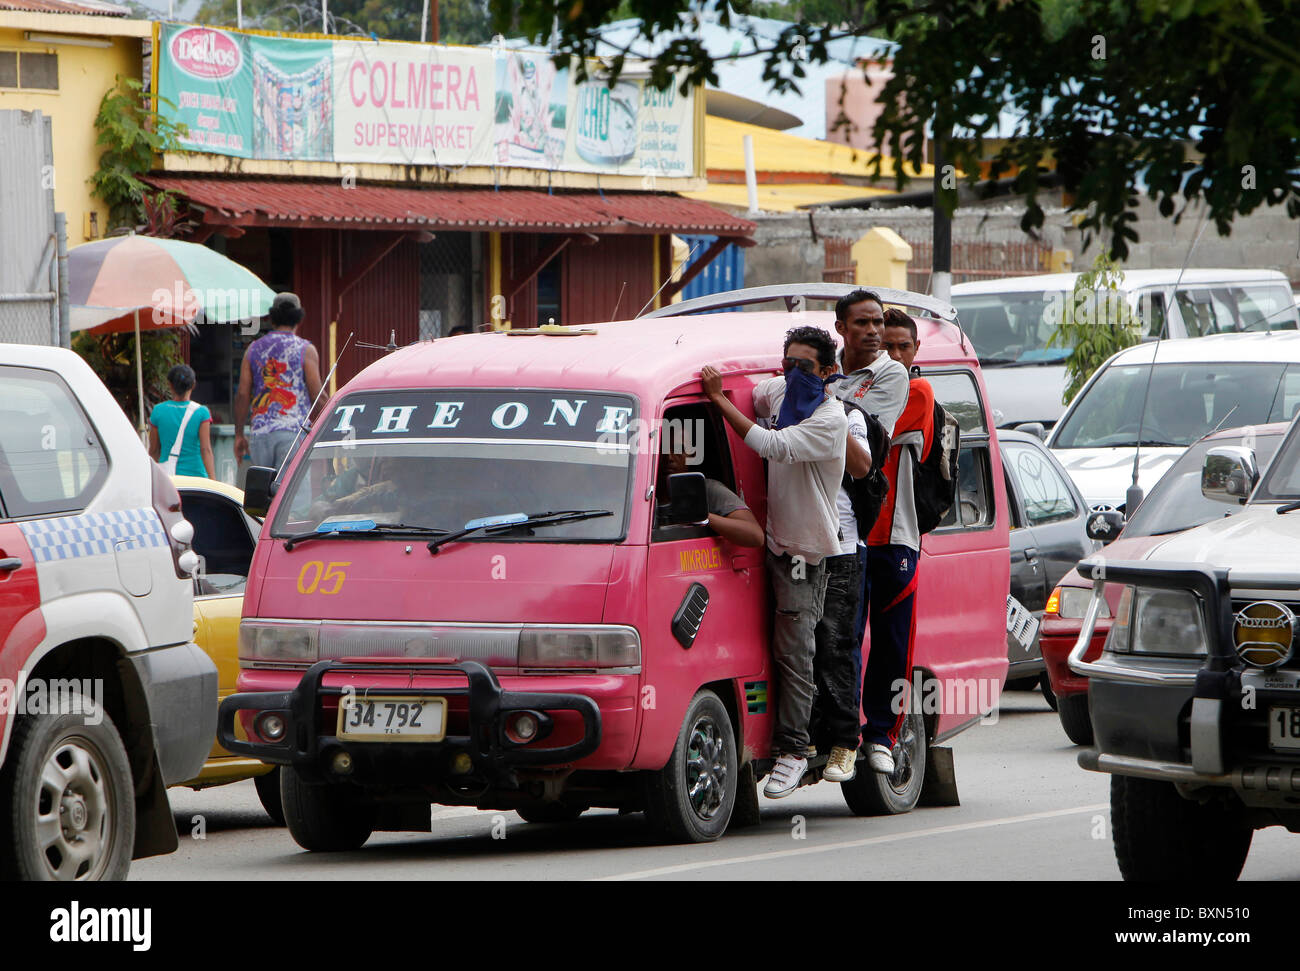 A Mikrolet (minibus) public transport in Dili, capital of Timor Leste (East Timor) - Stock Image